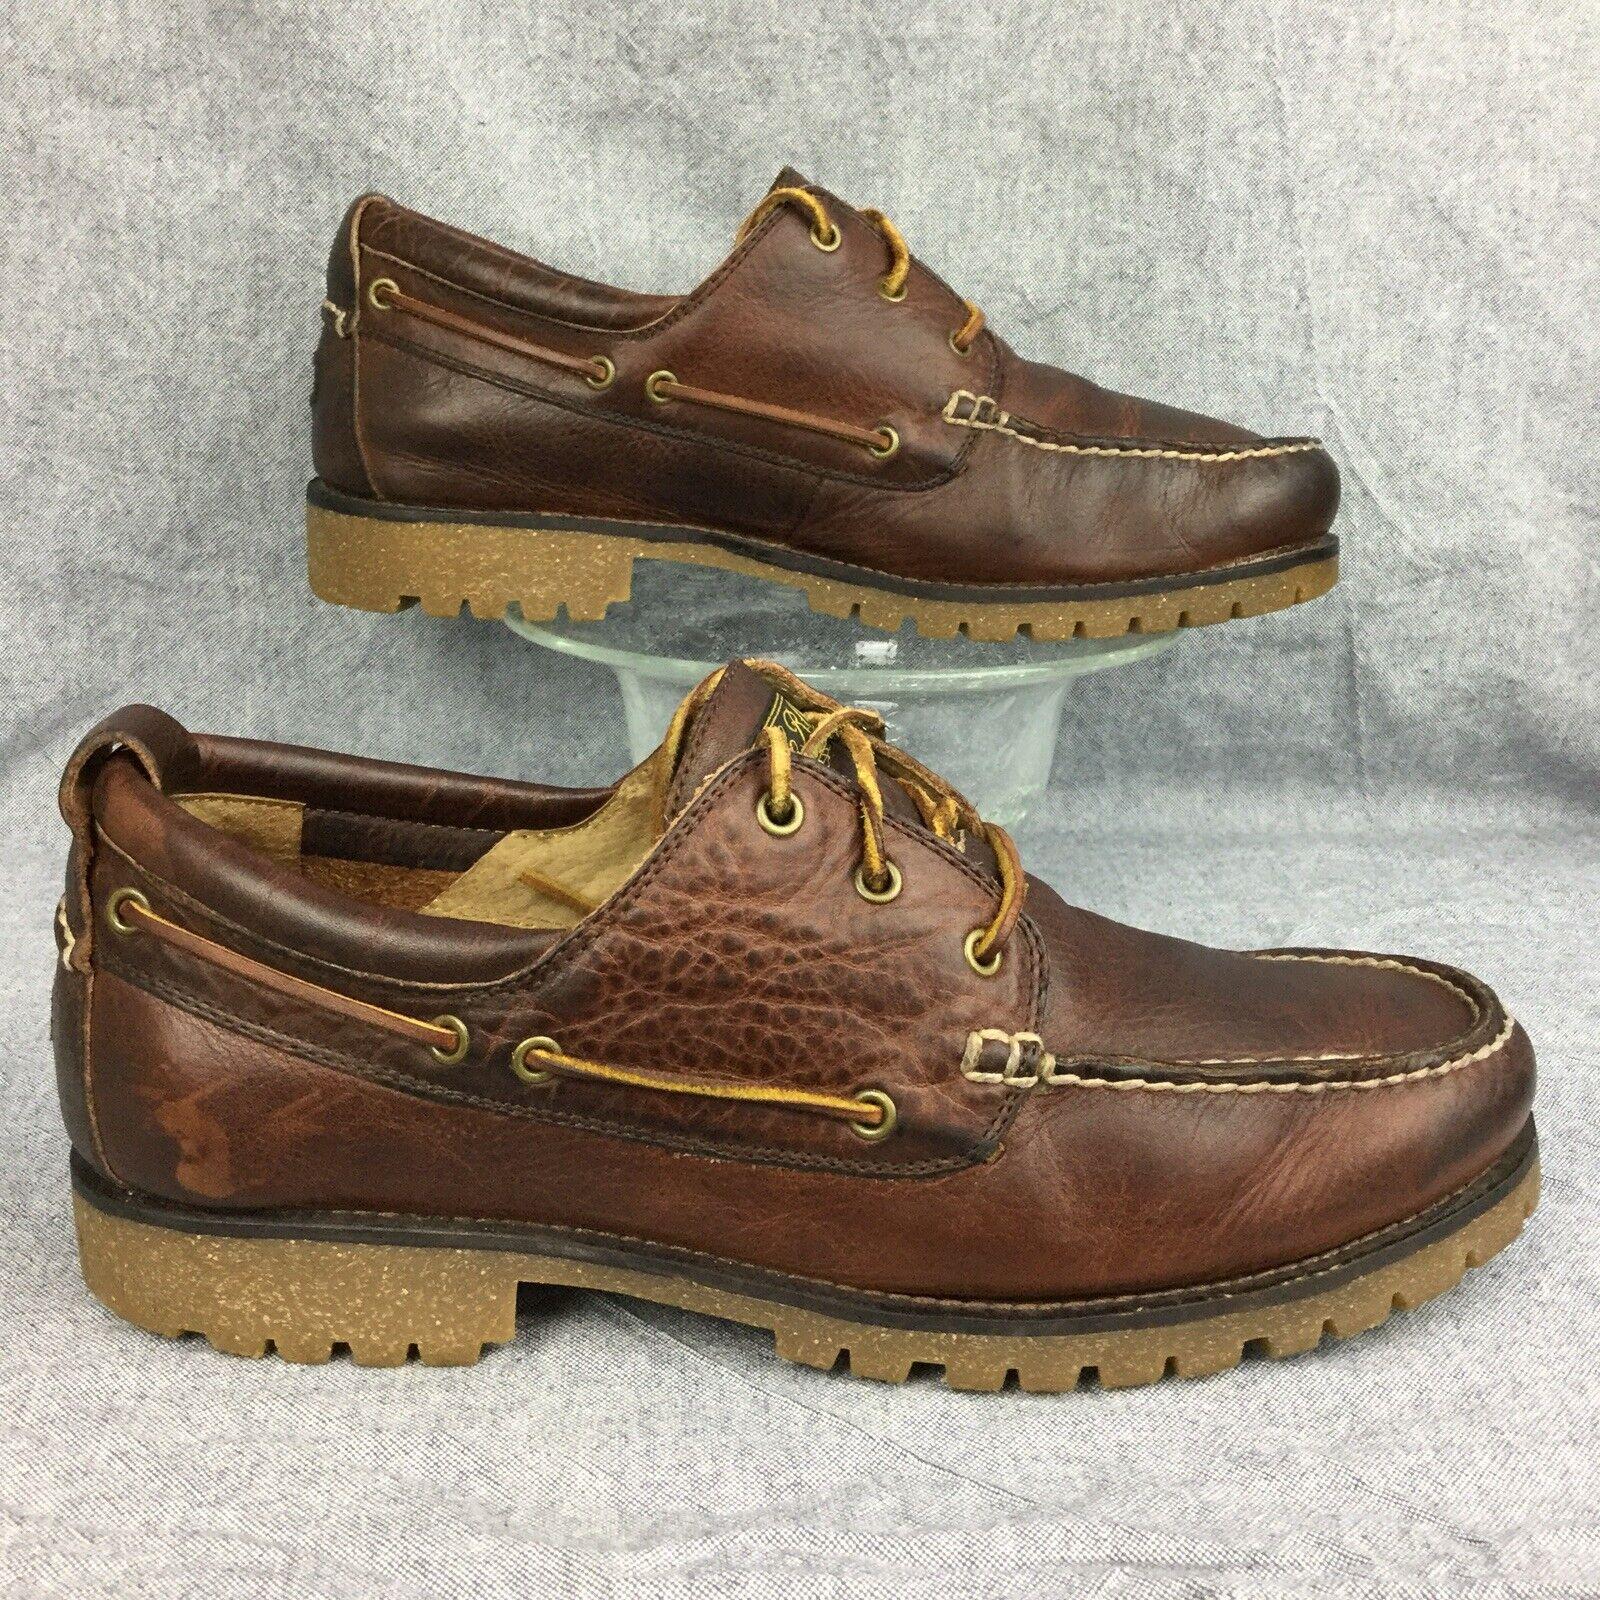 Vintage POLO RALPH LAUREN REEGAN Engineer grain moc toe boat oxford boot shoe 10